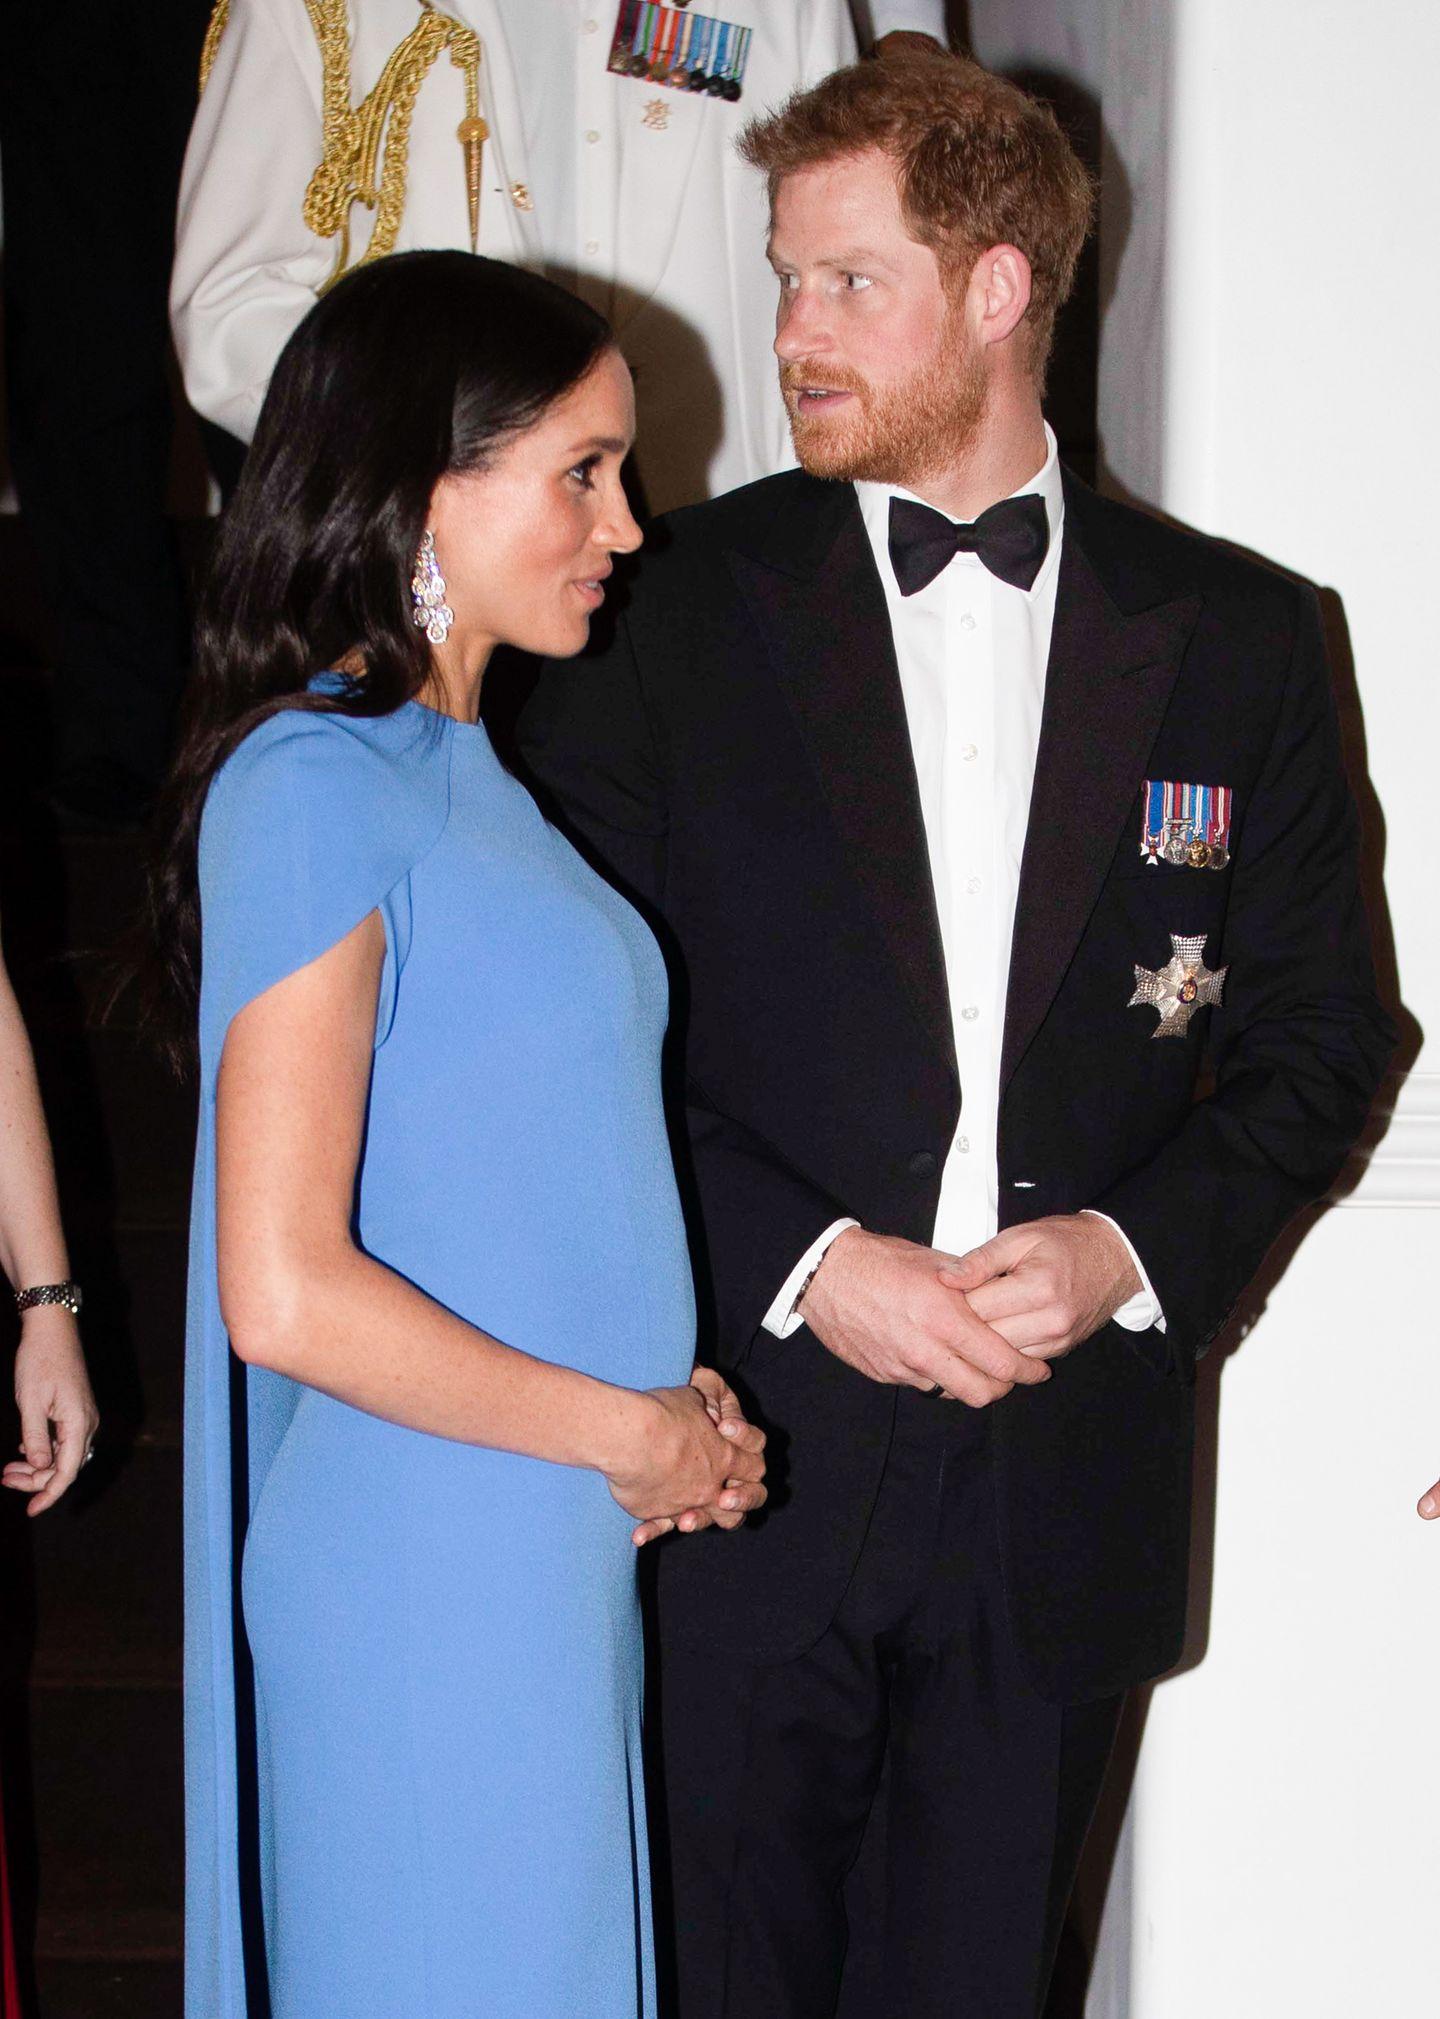 Meghan Markle Schwangerschaftslooks: Meghan Markle und Prinz Harry